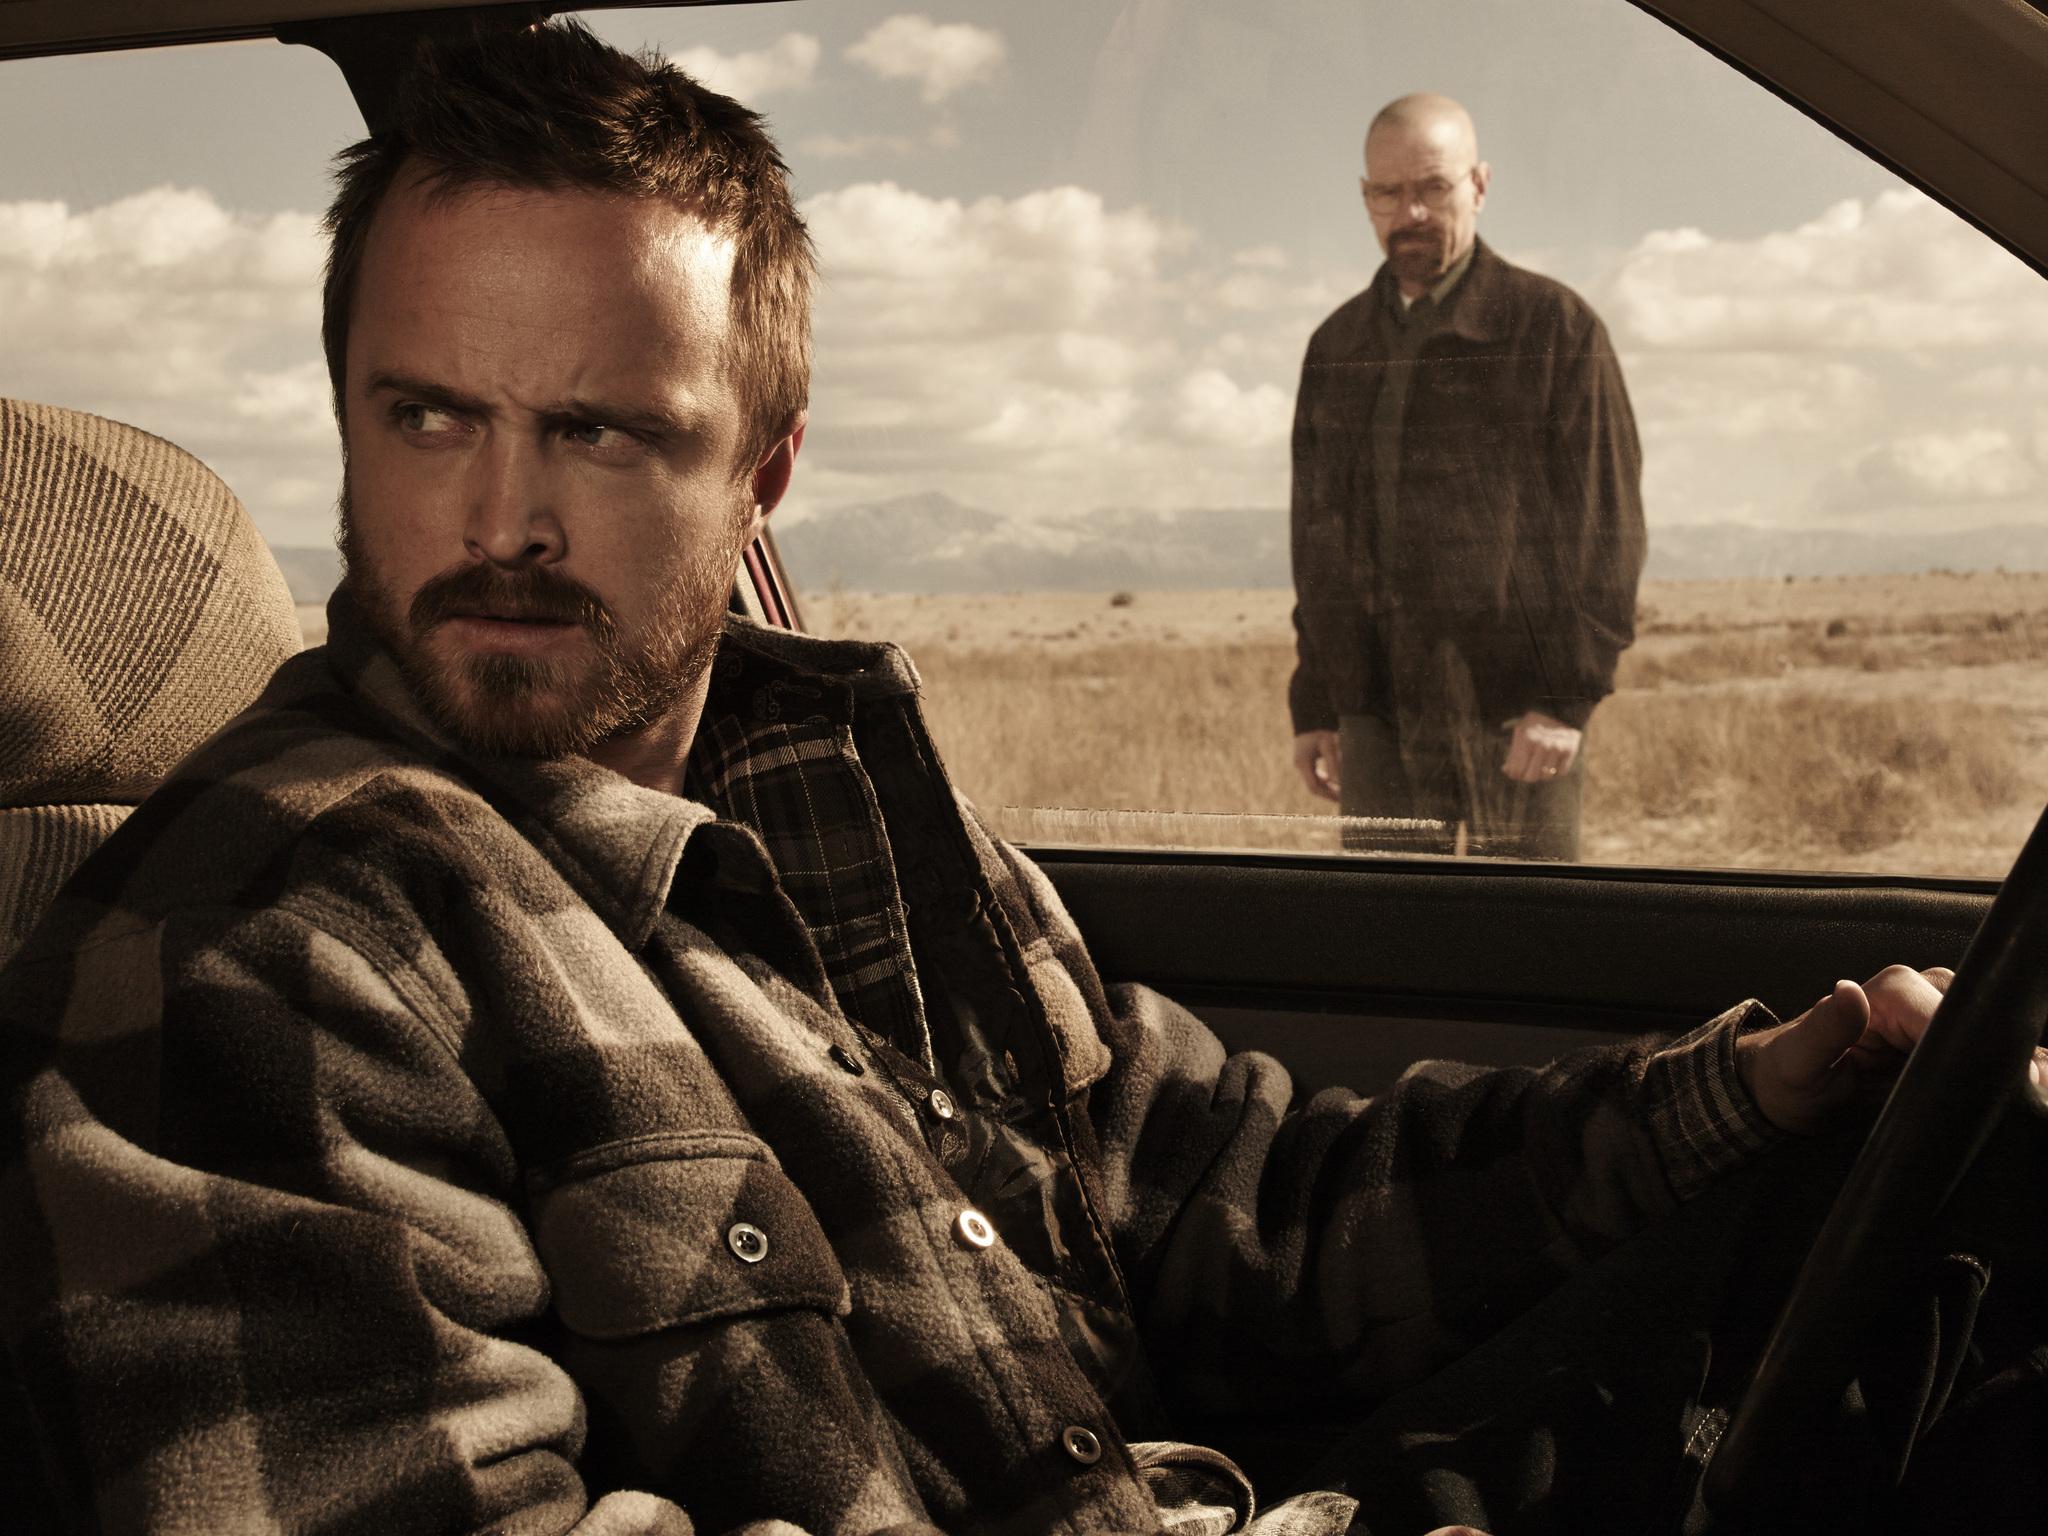 Bryan Cranston and Aaron Paul in Breaking Bad (2008)